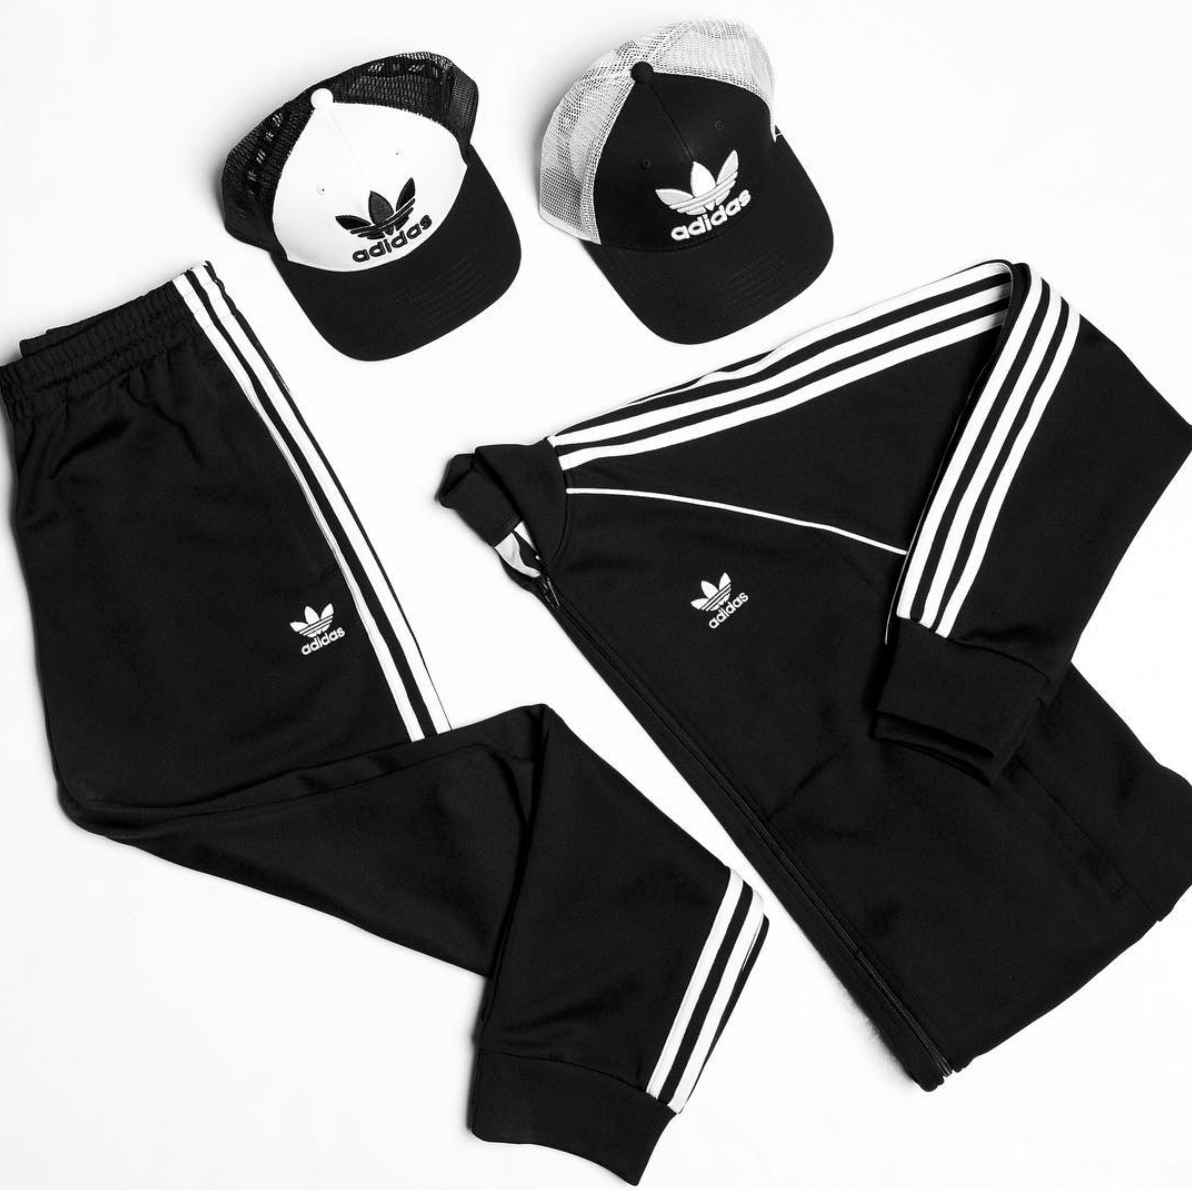 Adidas Originals Superstar chaqueta pantalones gorras